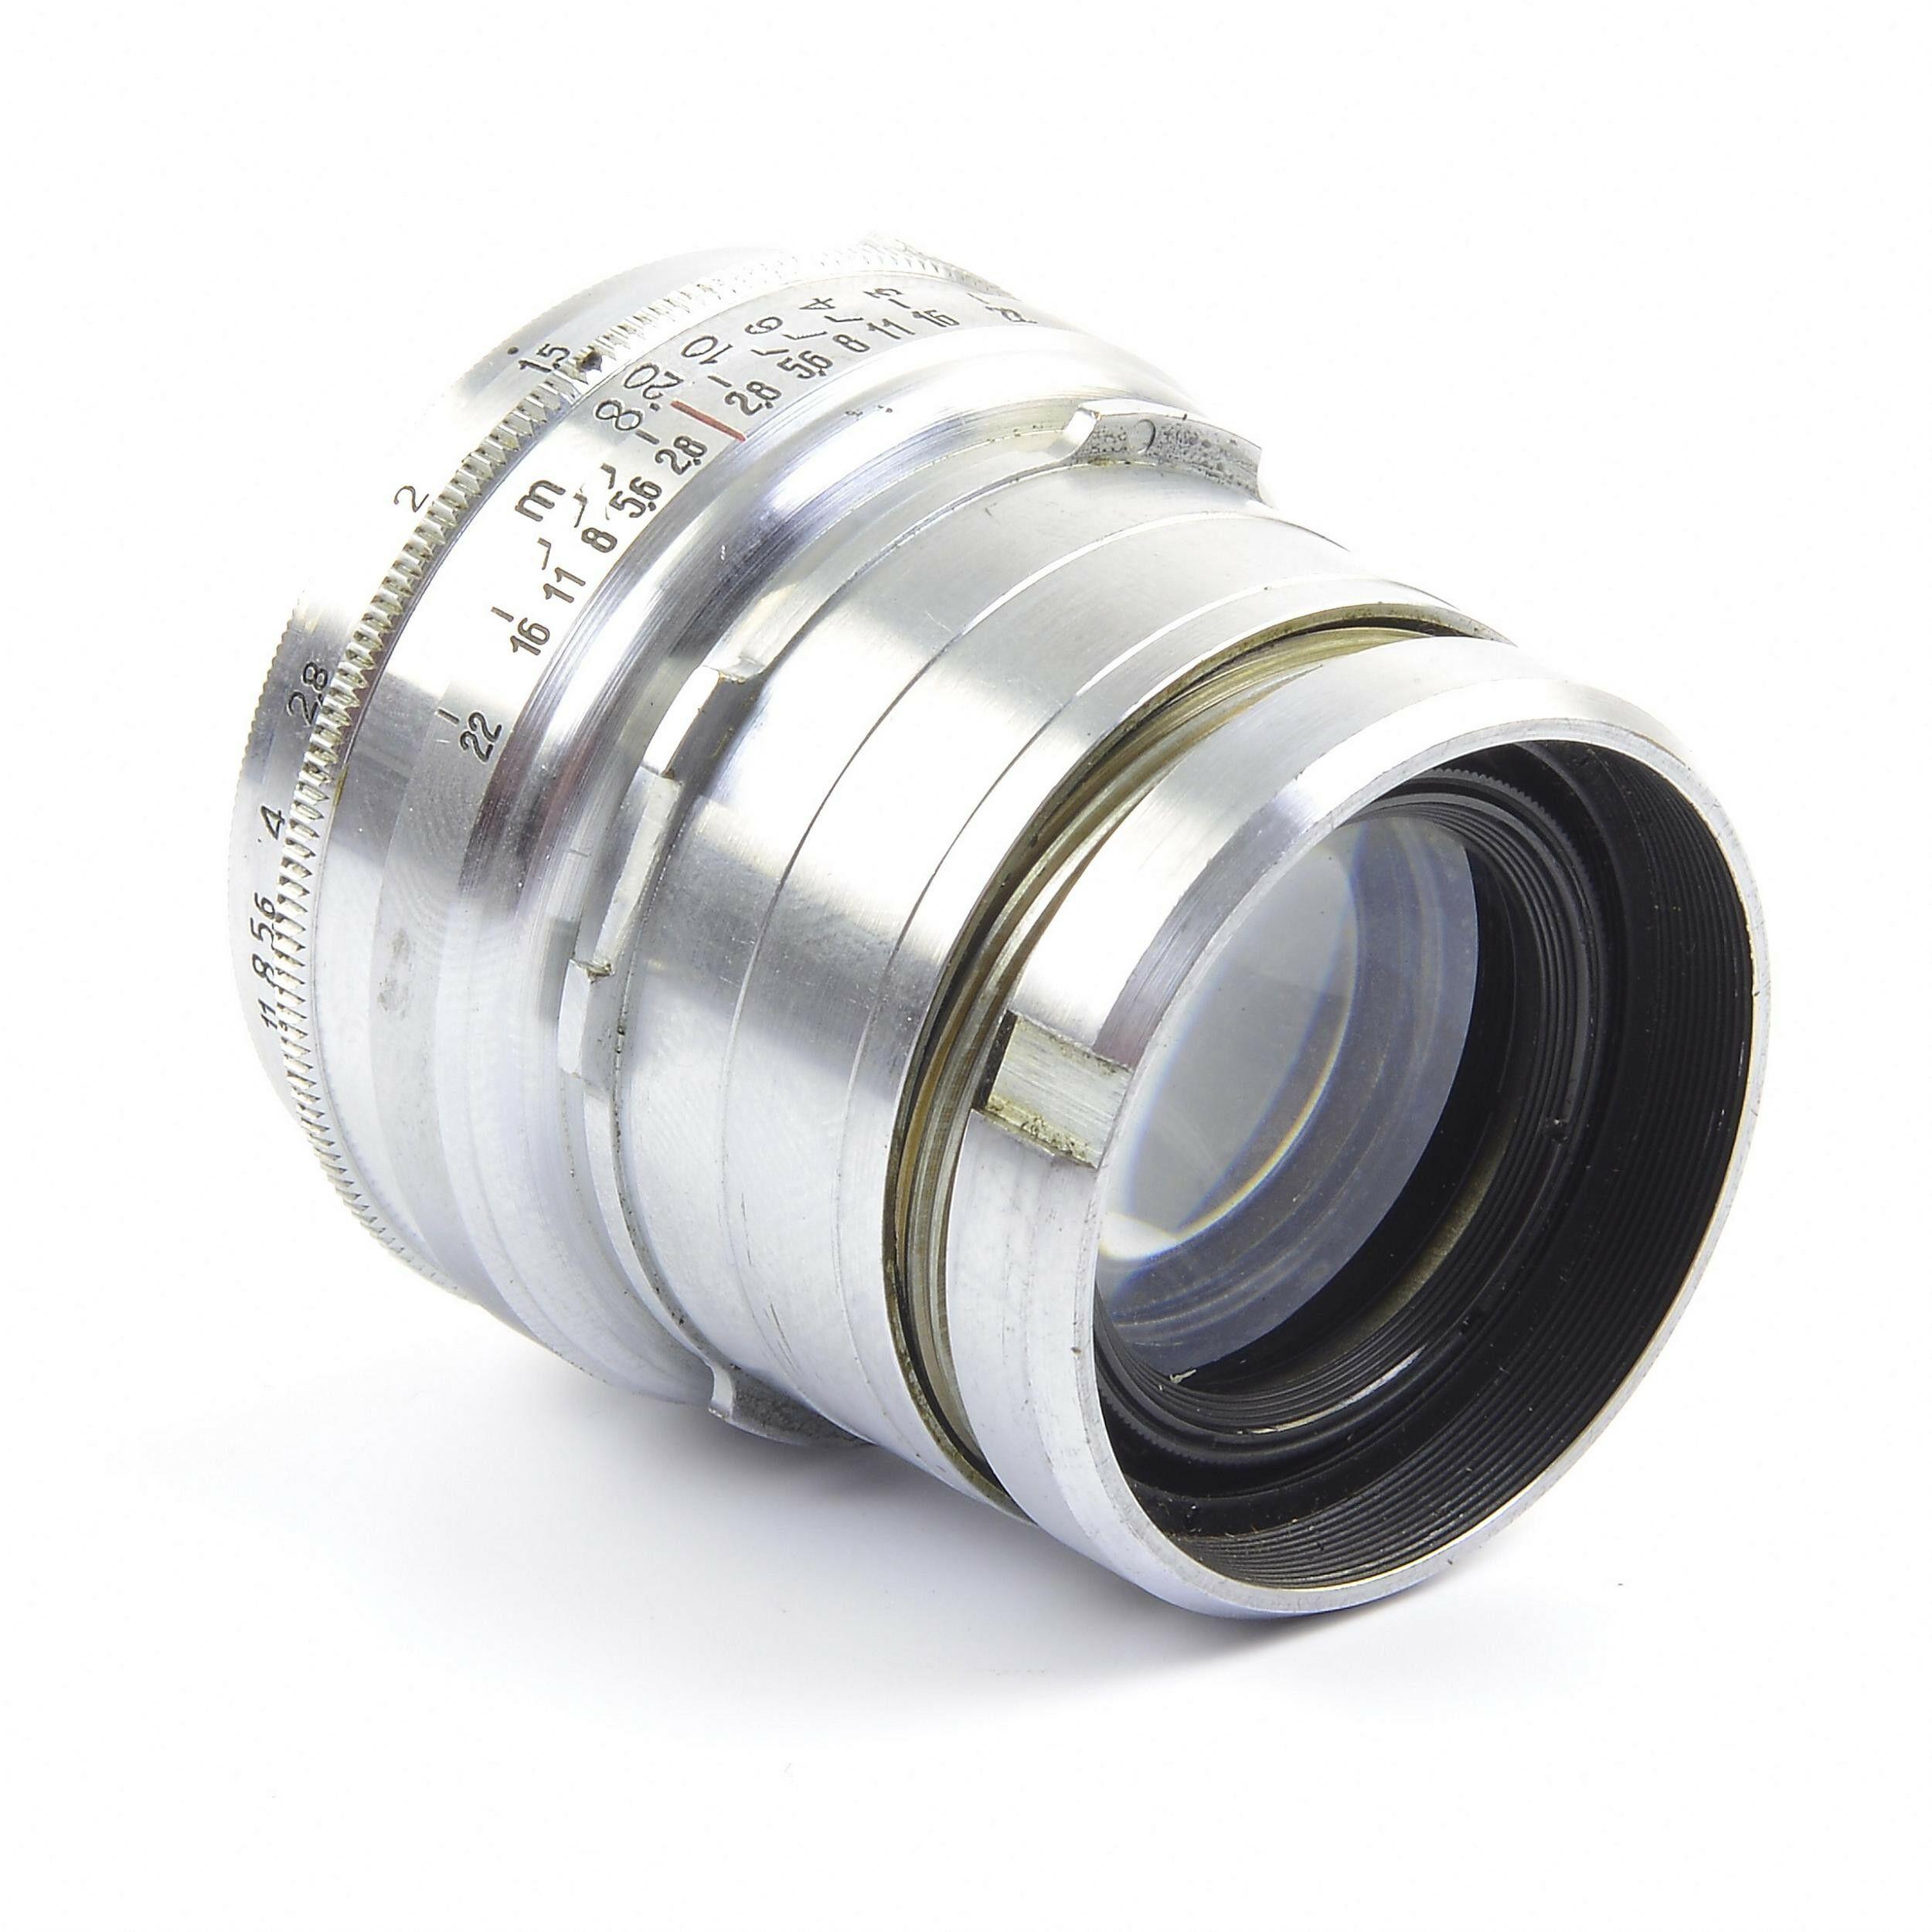 Zeiss Ikon Contaflex TLR + 50mm f1 5 Sonnar Lens